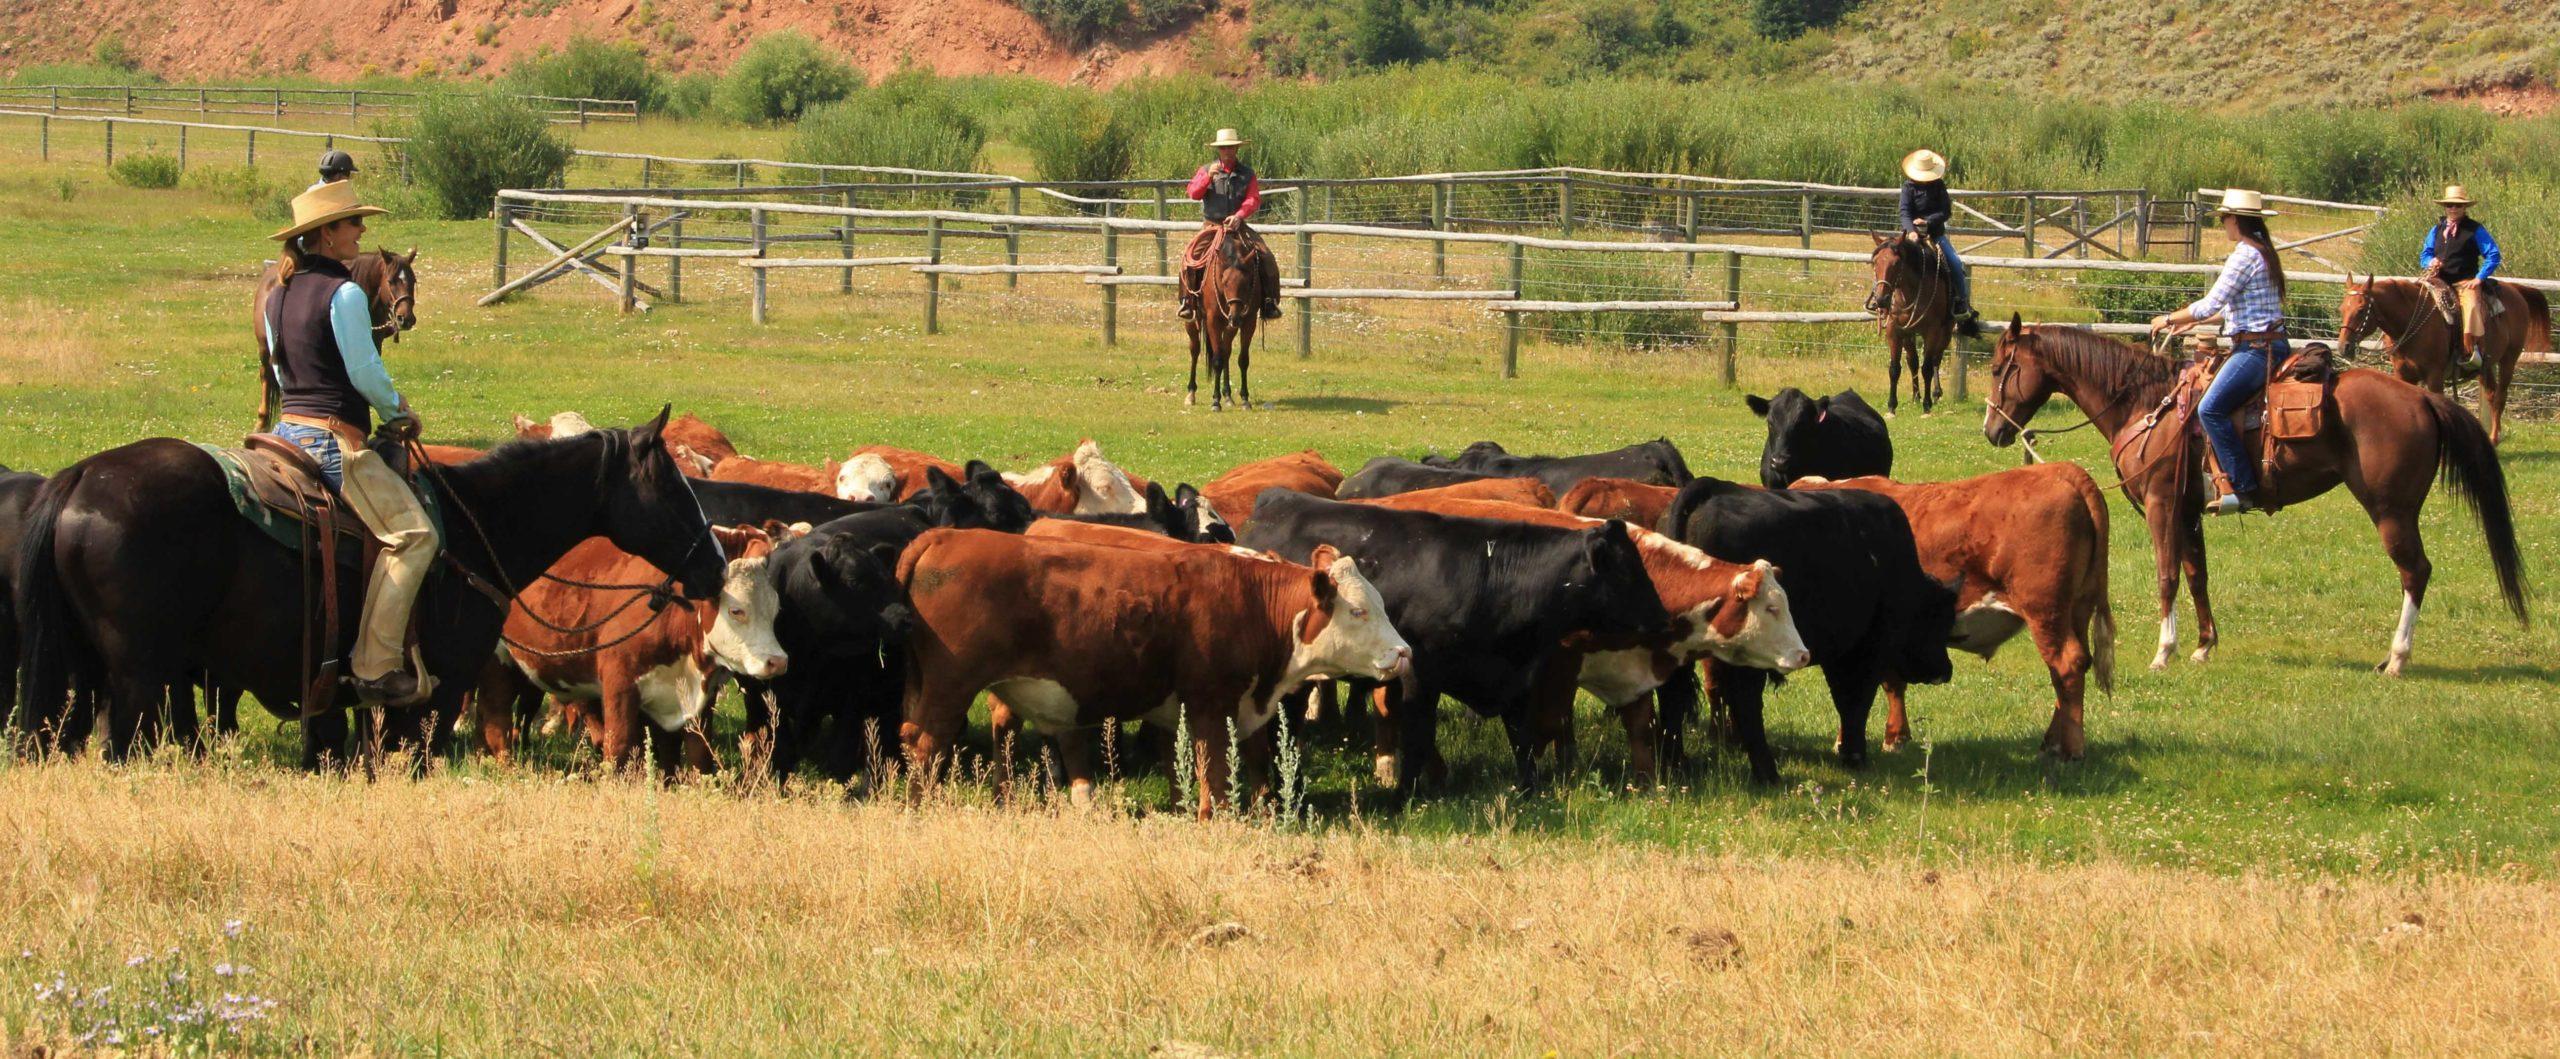 Red Rock Ranch Cattle Work Horsemanship